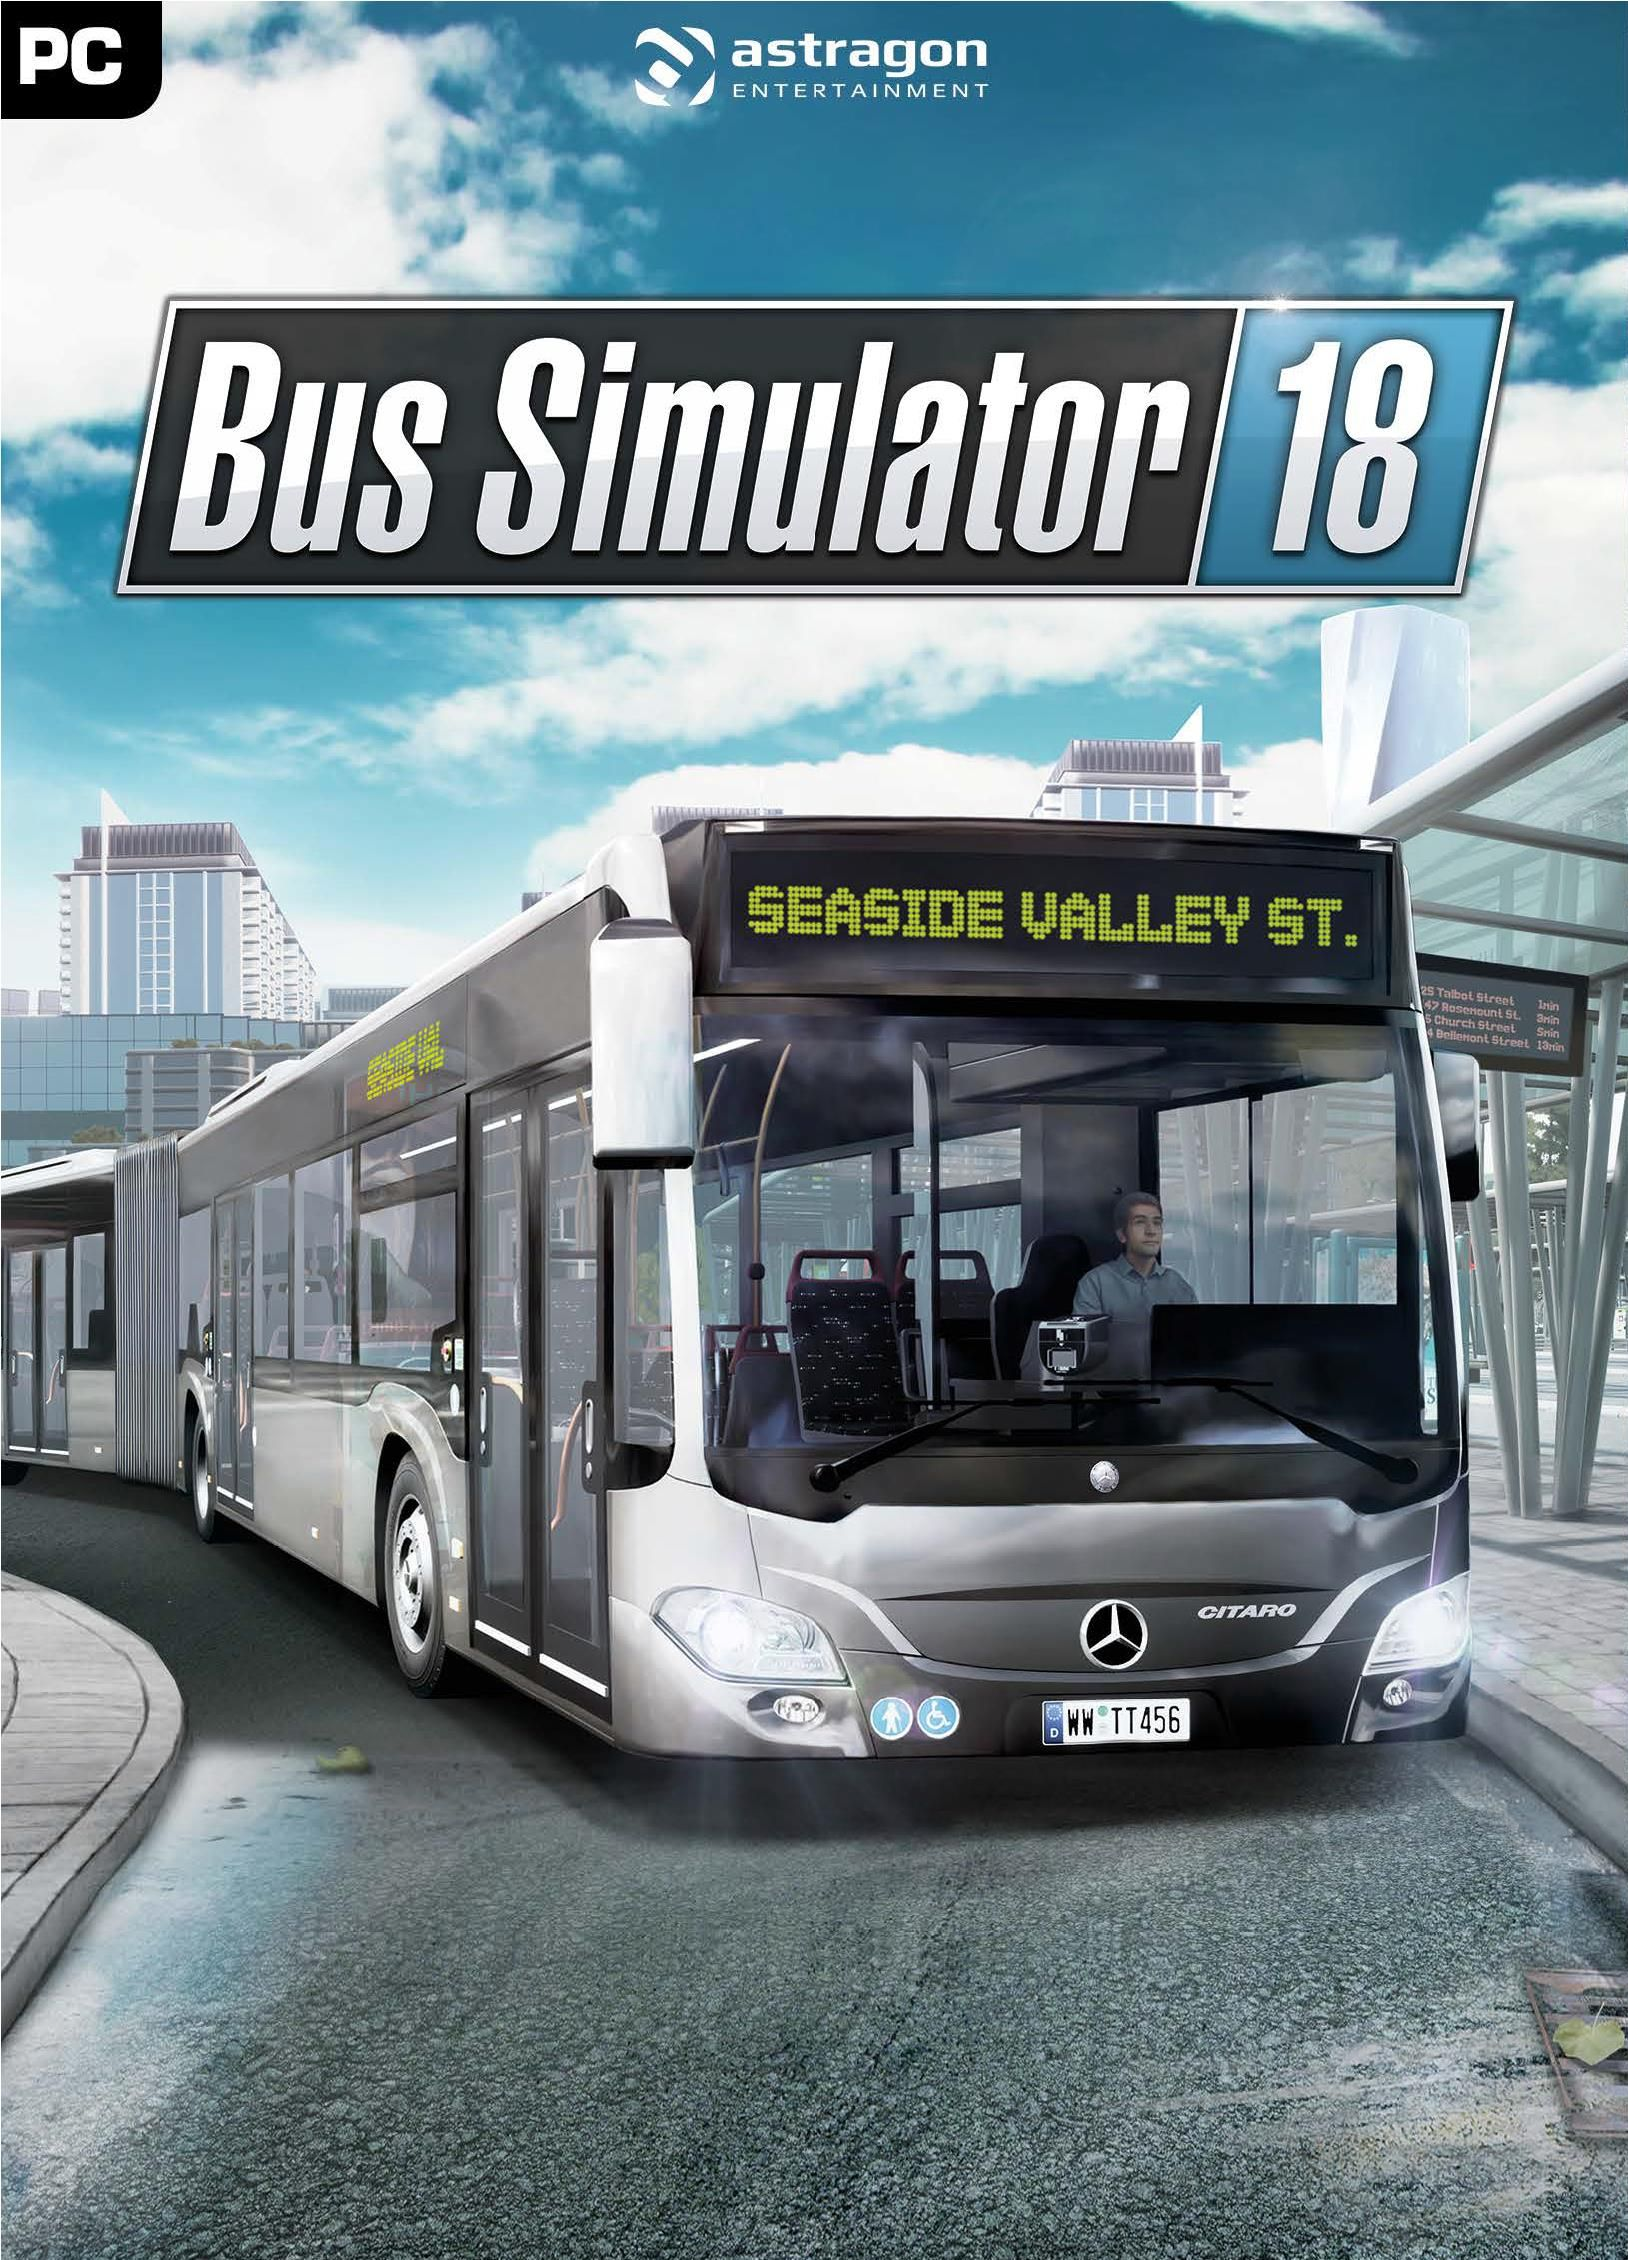 Bus Simulator 2018 Gra Pc Od 86 00 Zł Ceneo Pl